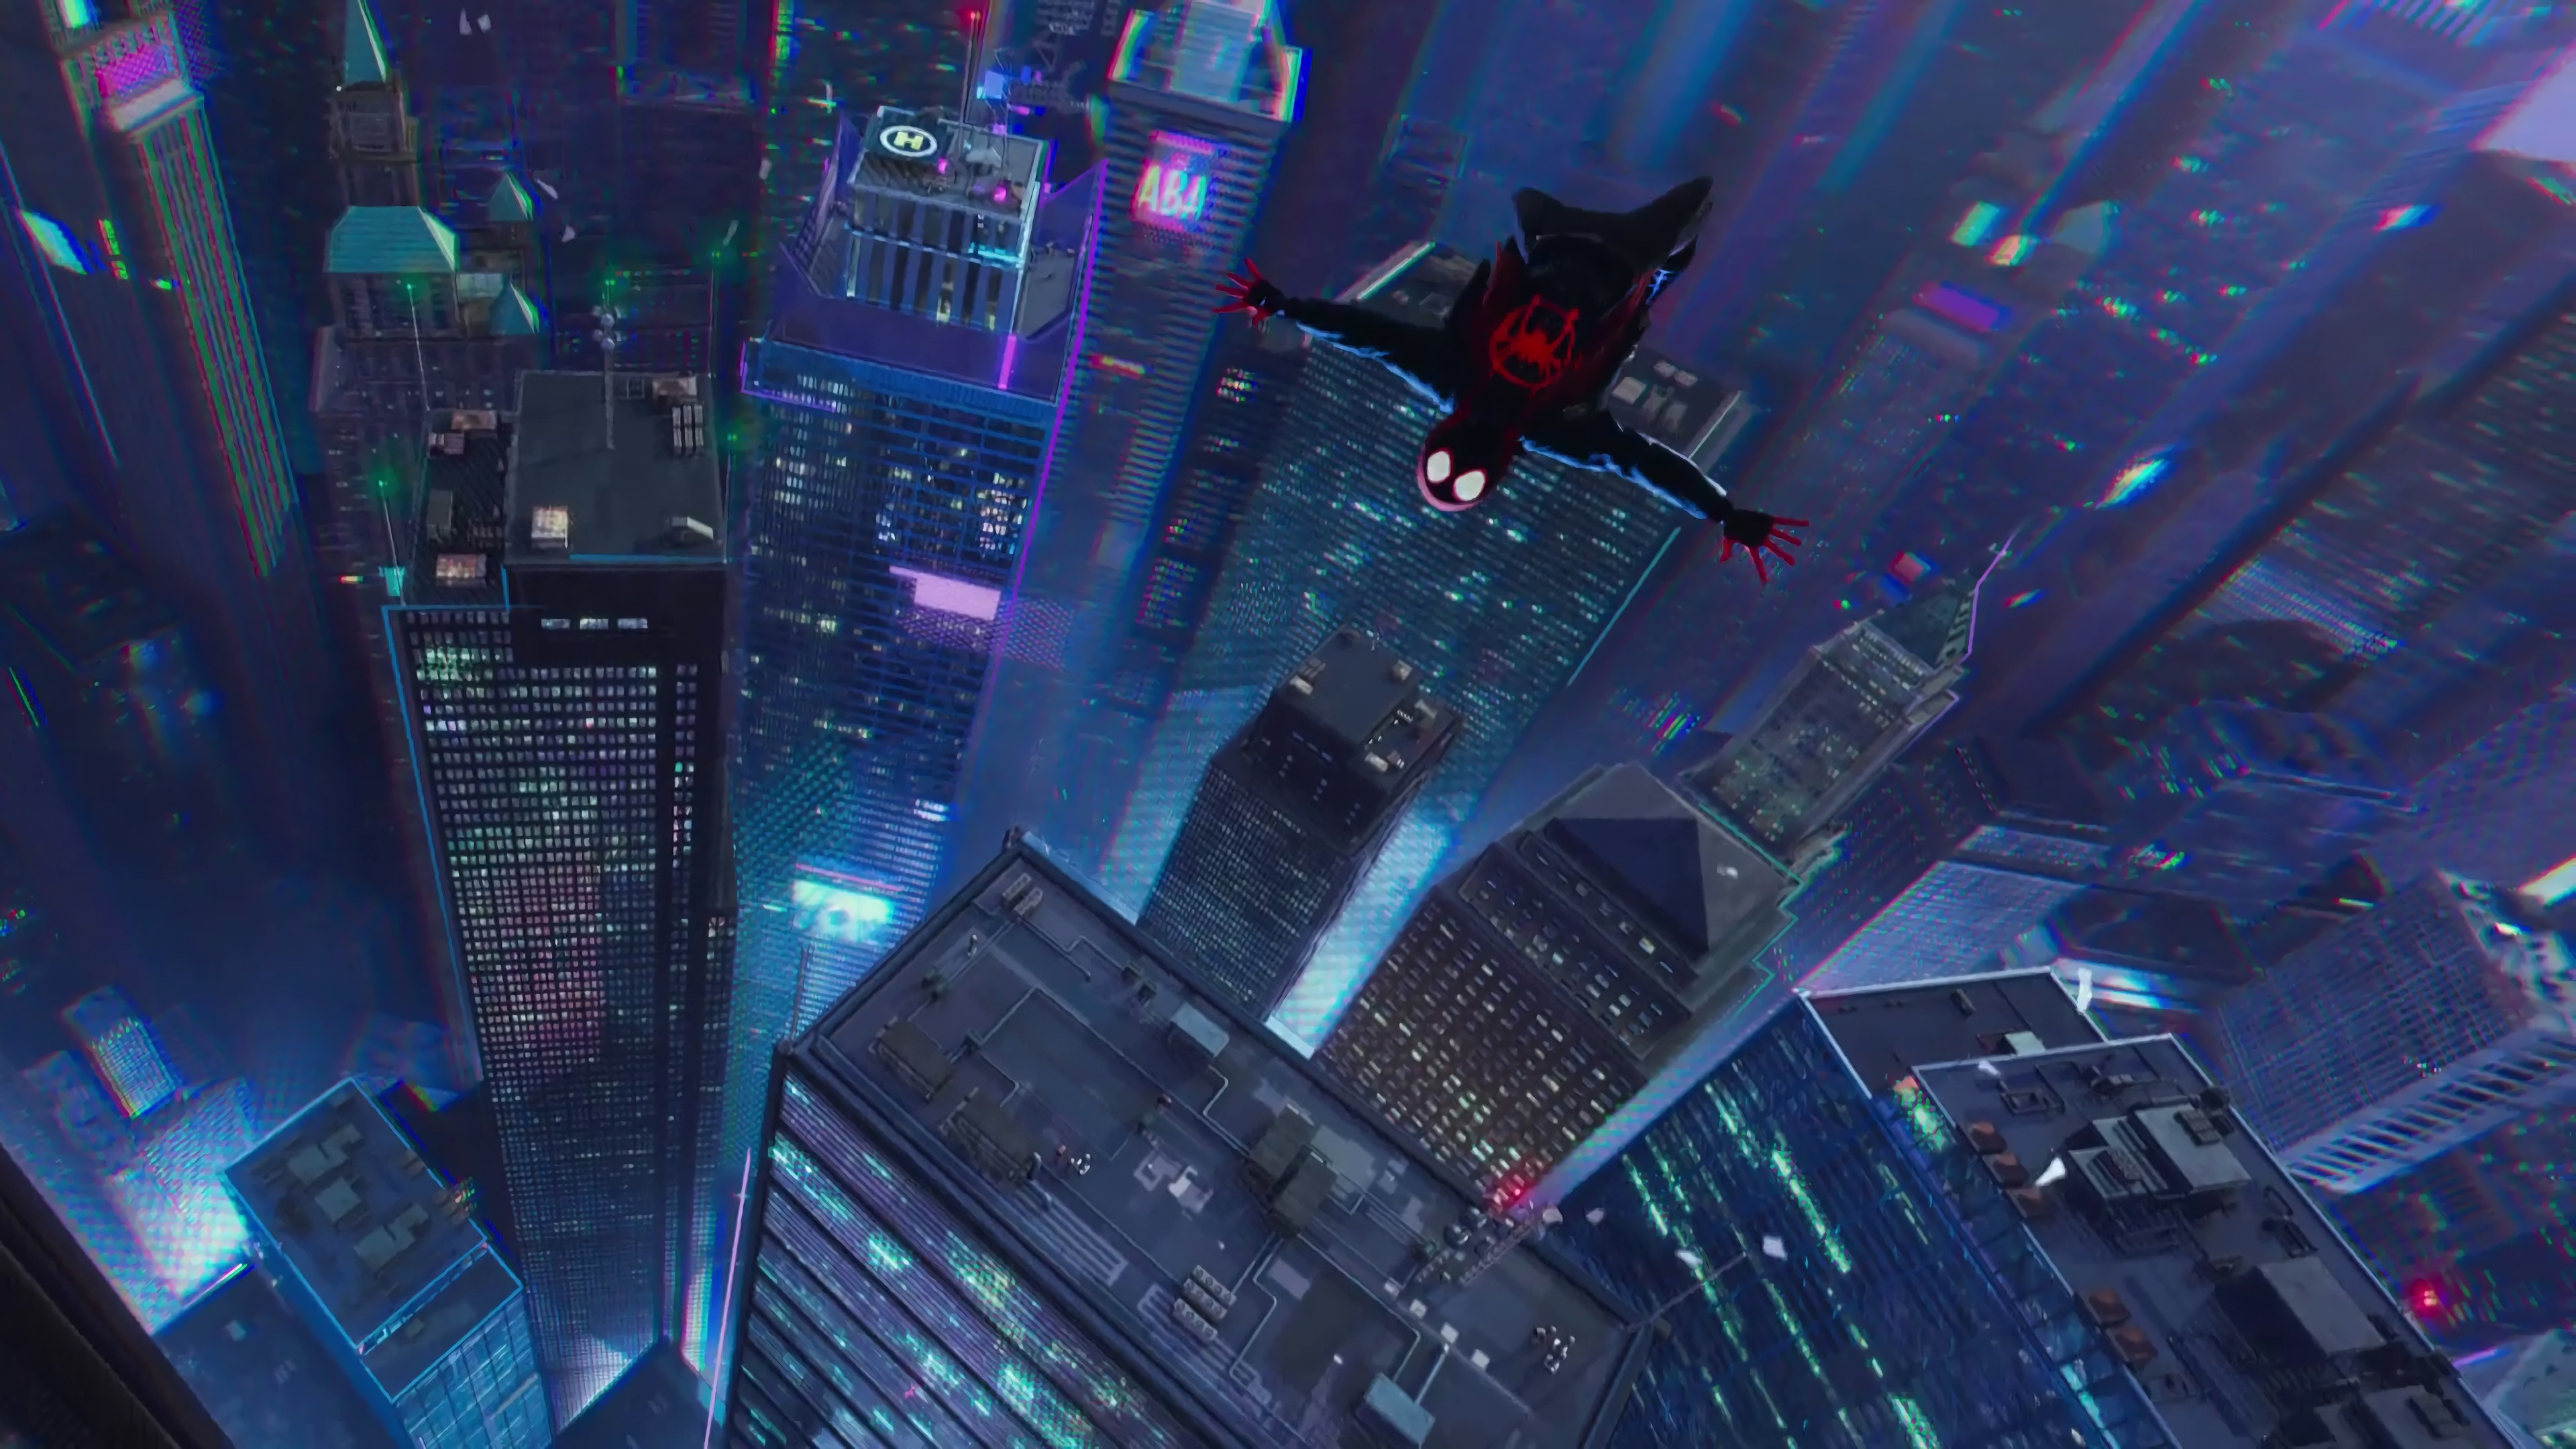 Wallpaper Spider Man Into The Spider Verse 4k Movies 20637